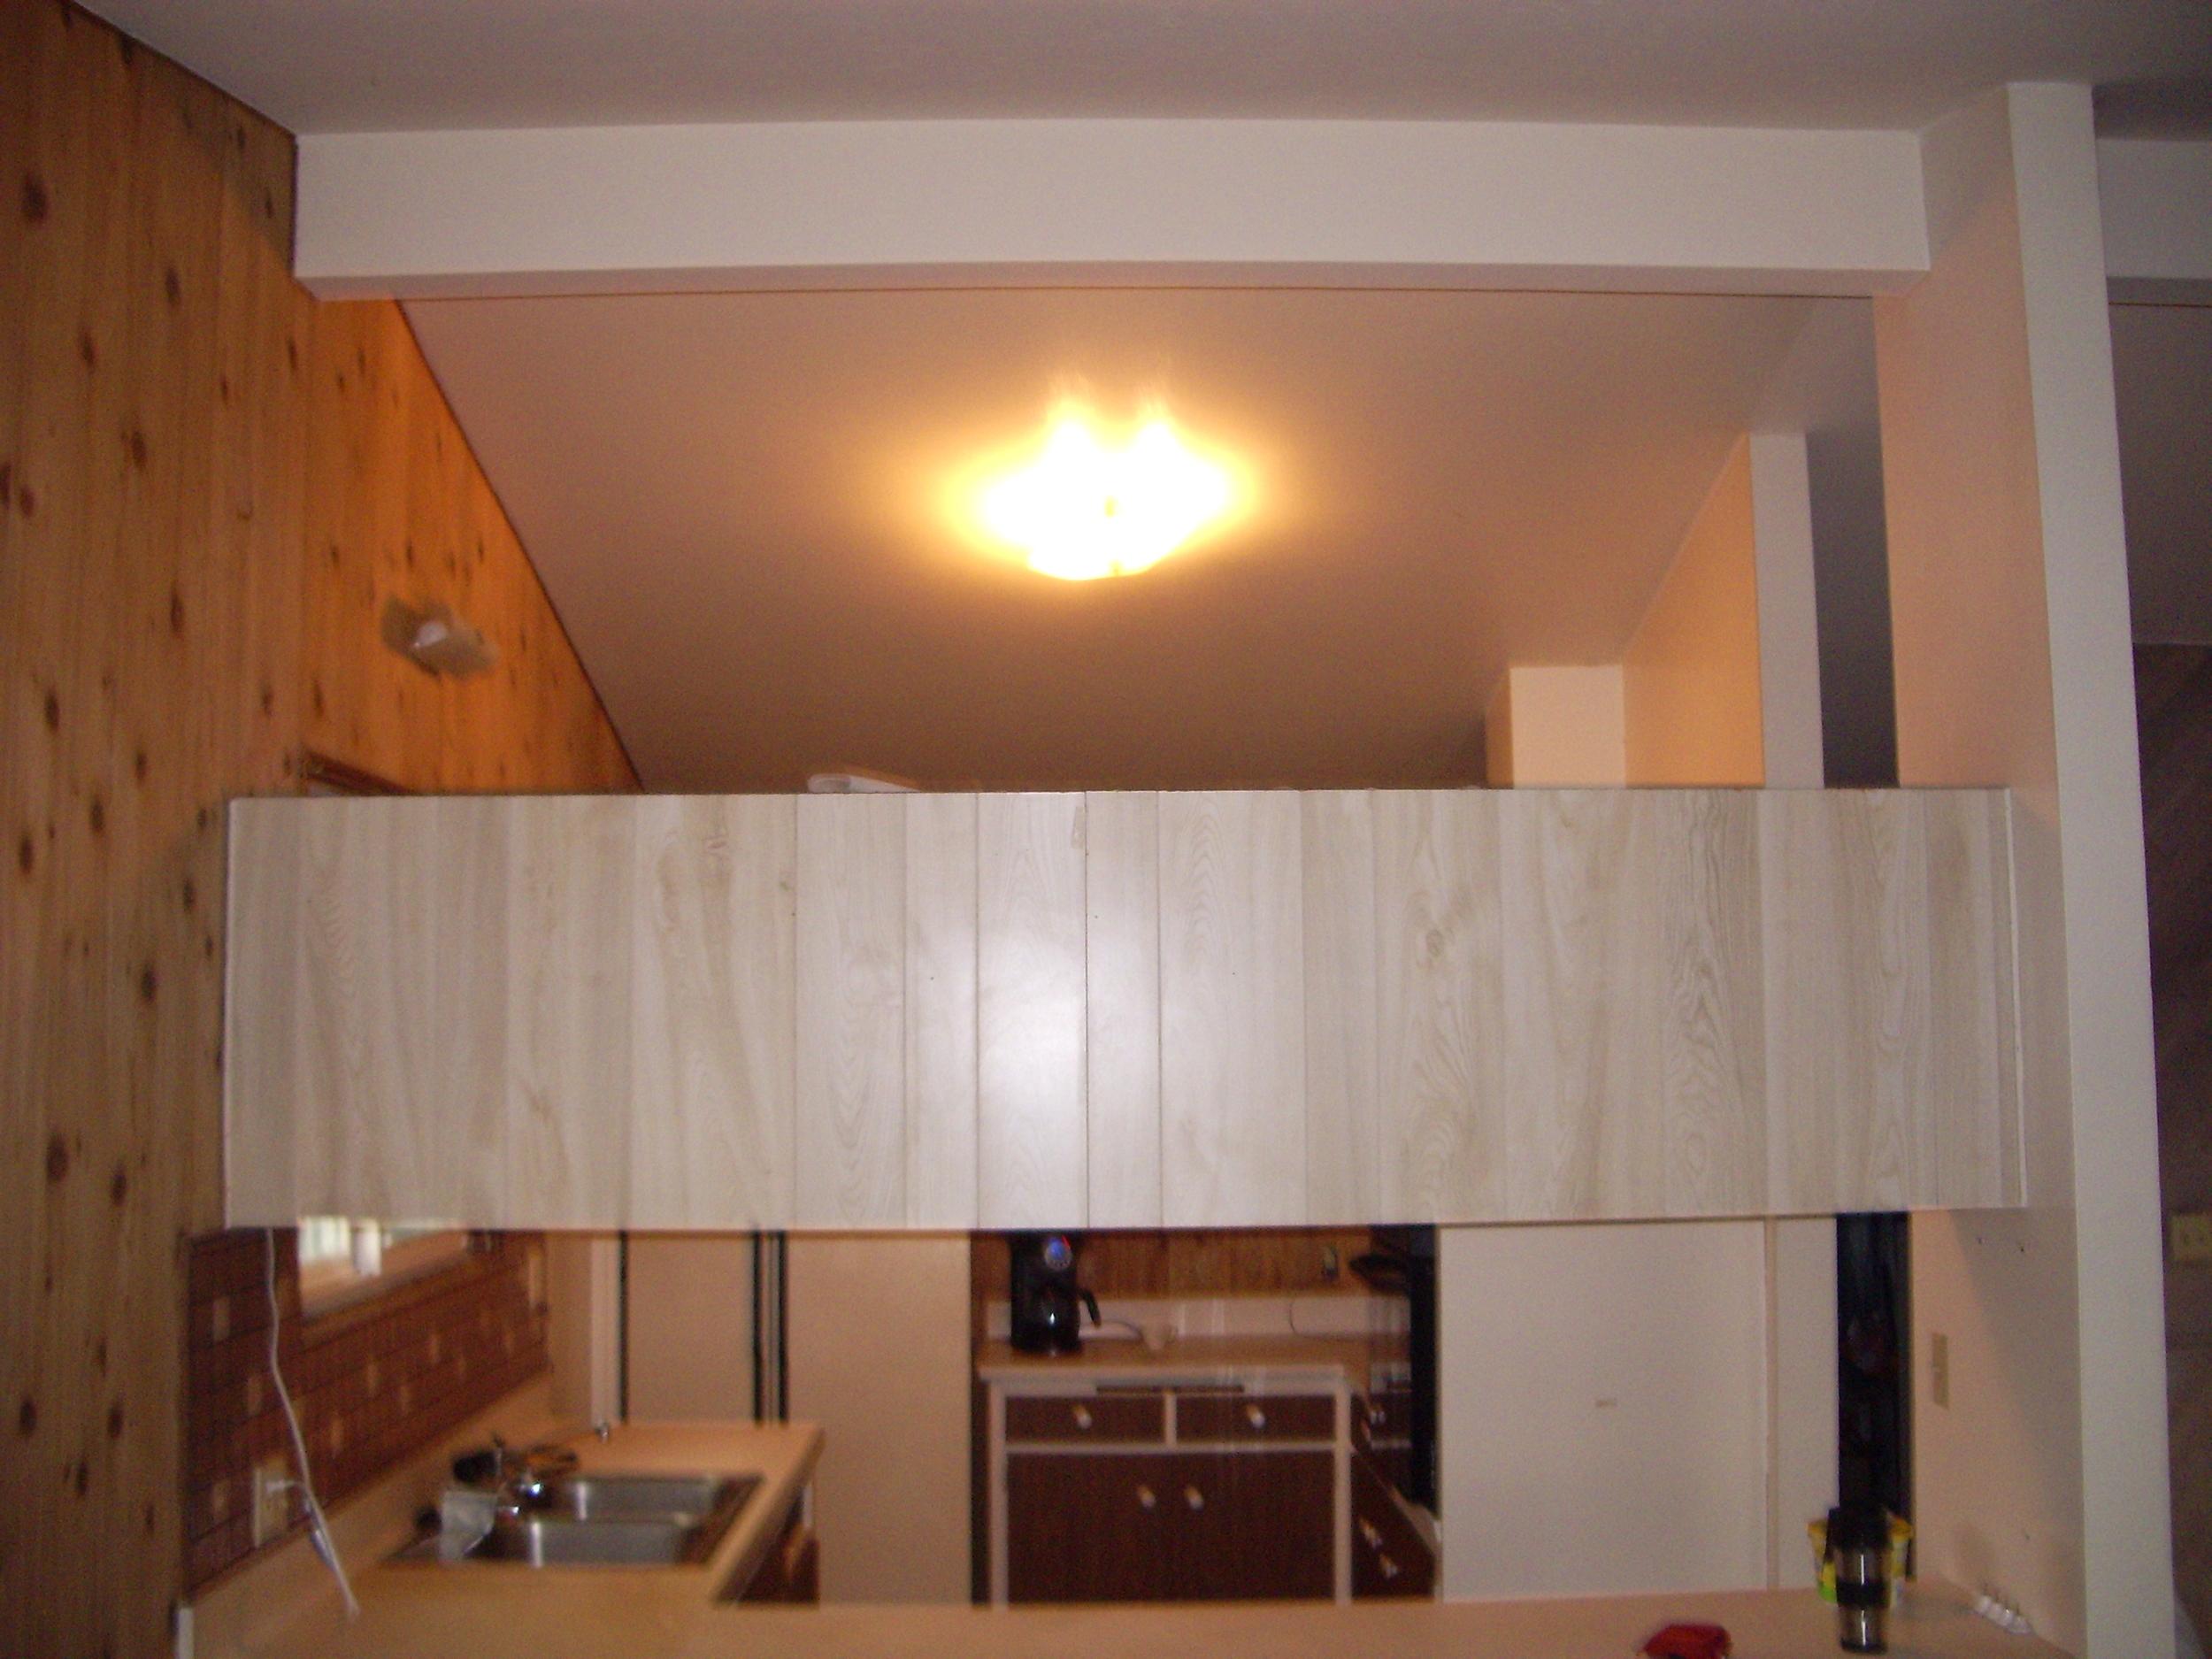 EAB Contemporary Kitchen Remodel 1.JPG